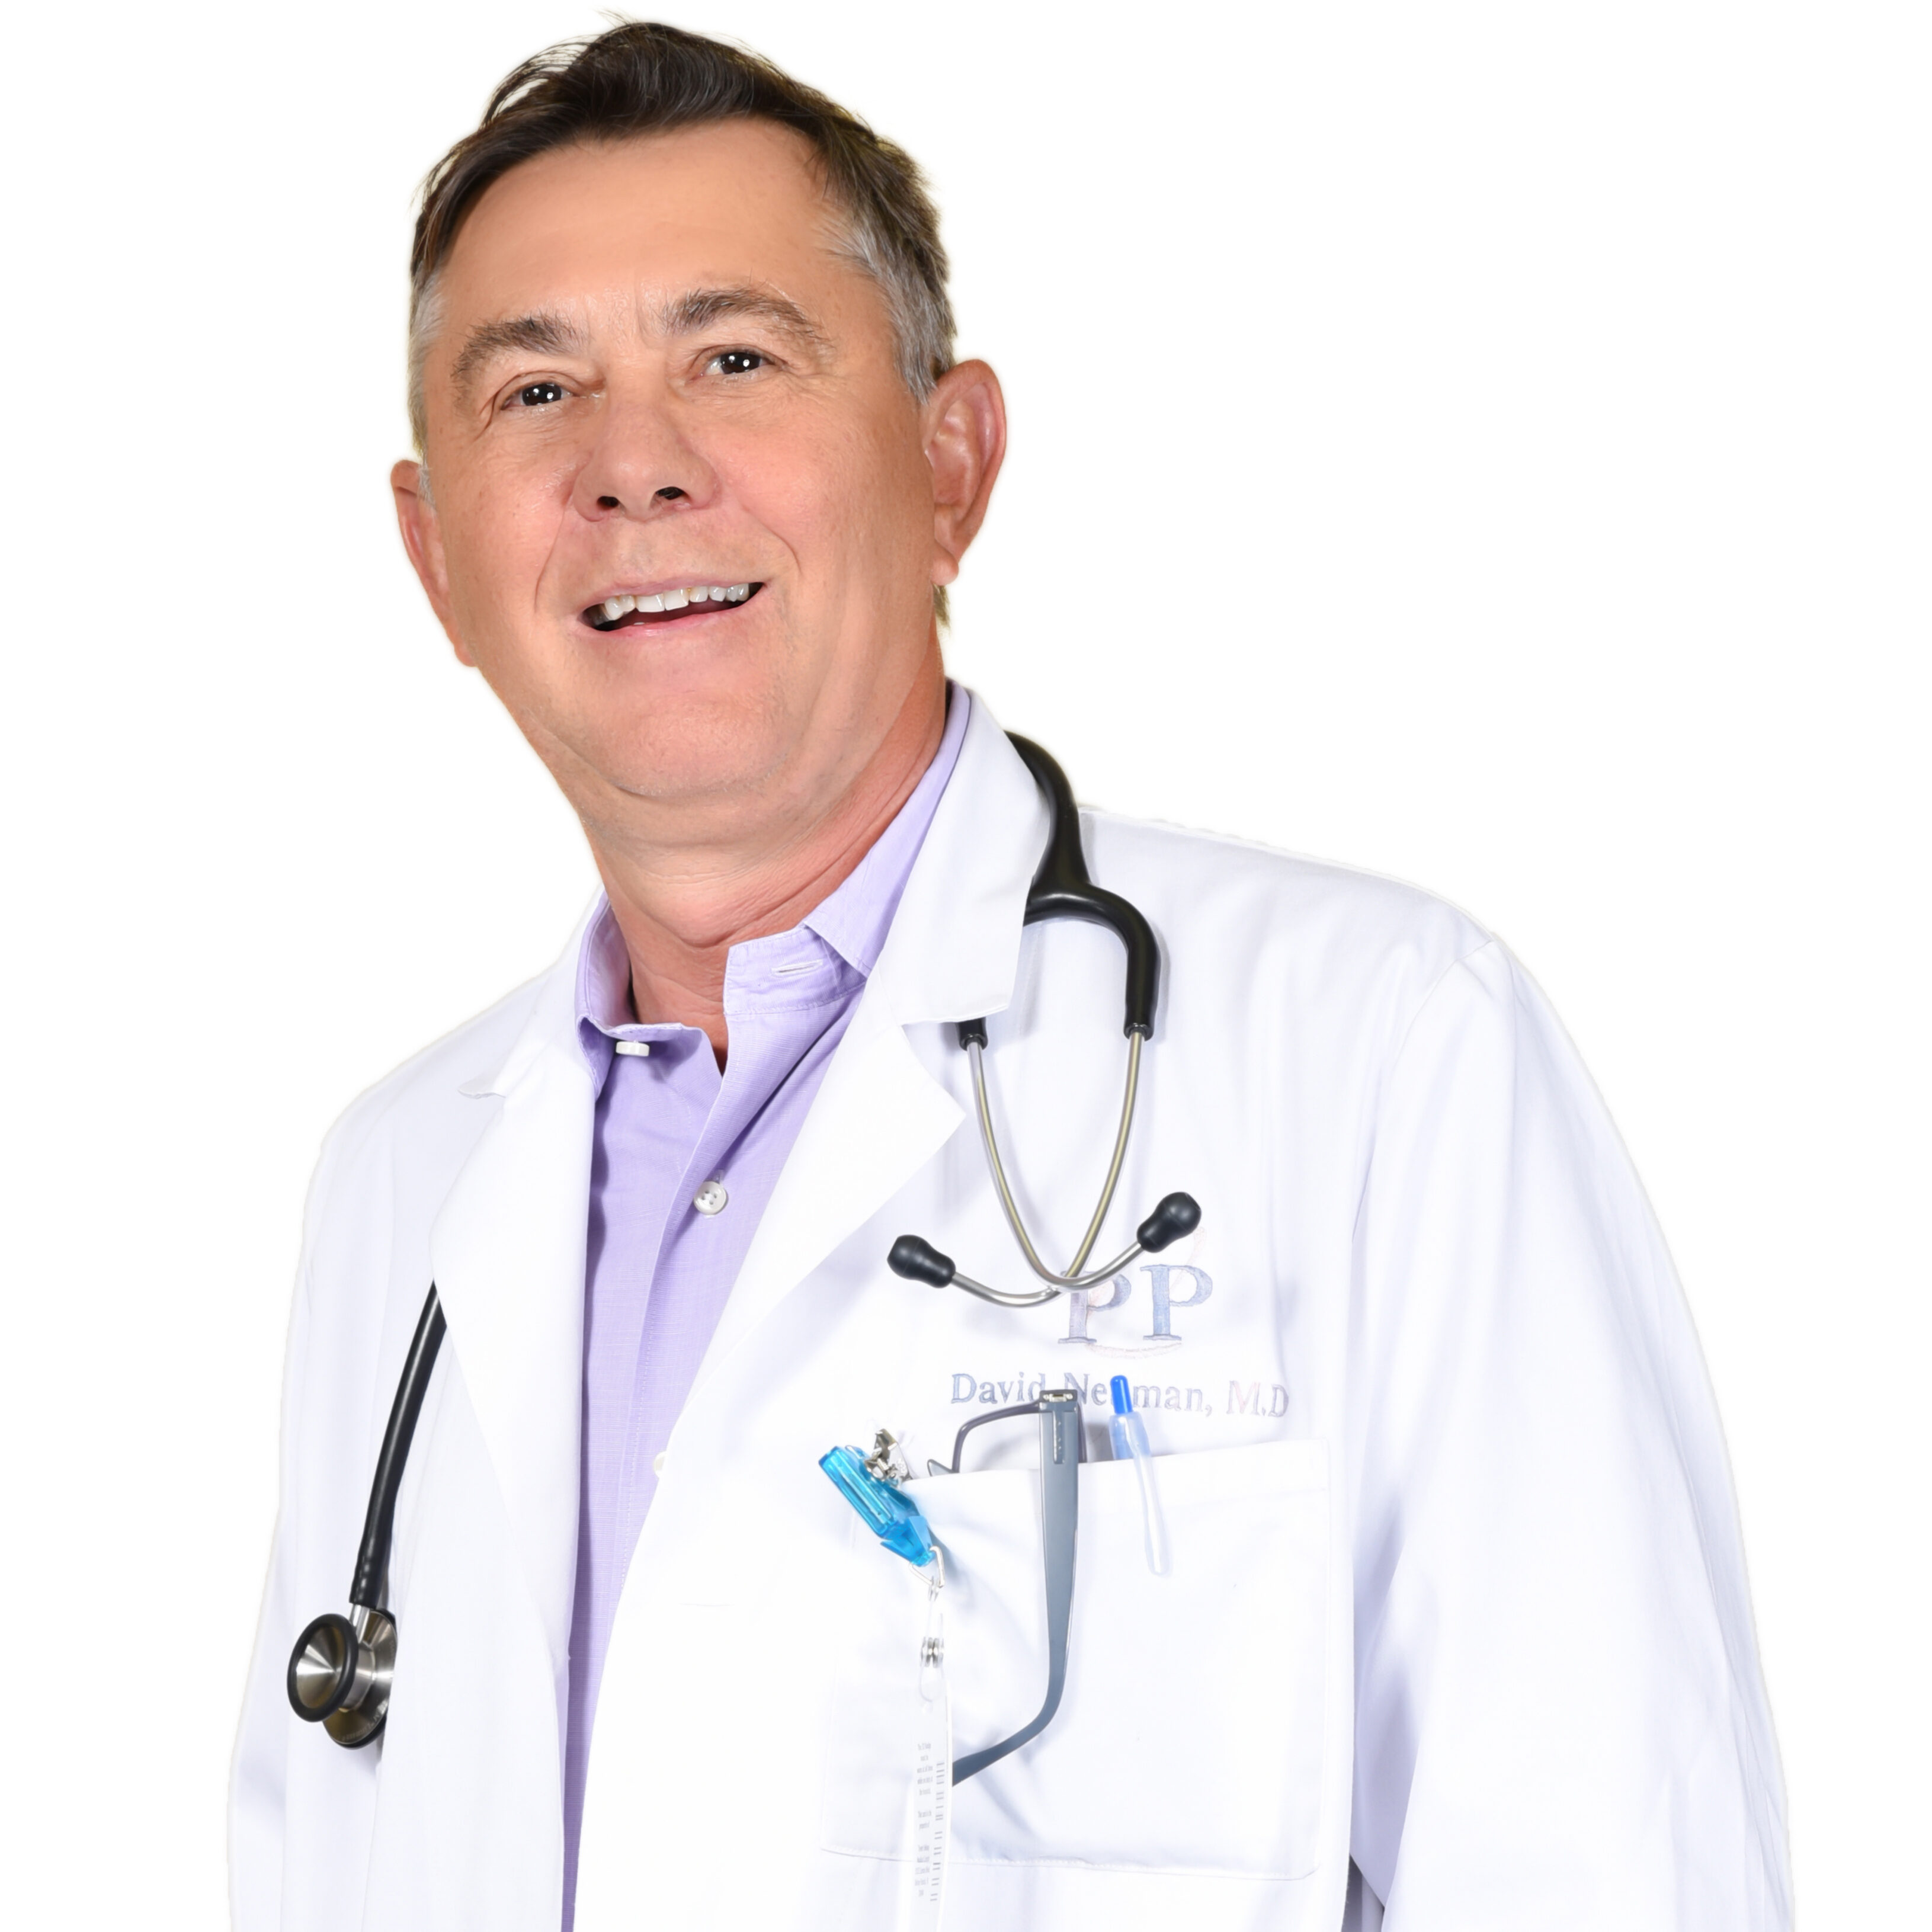 David Neuman, MD